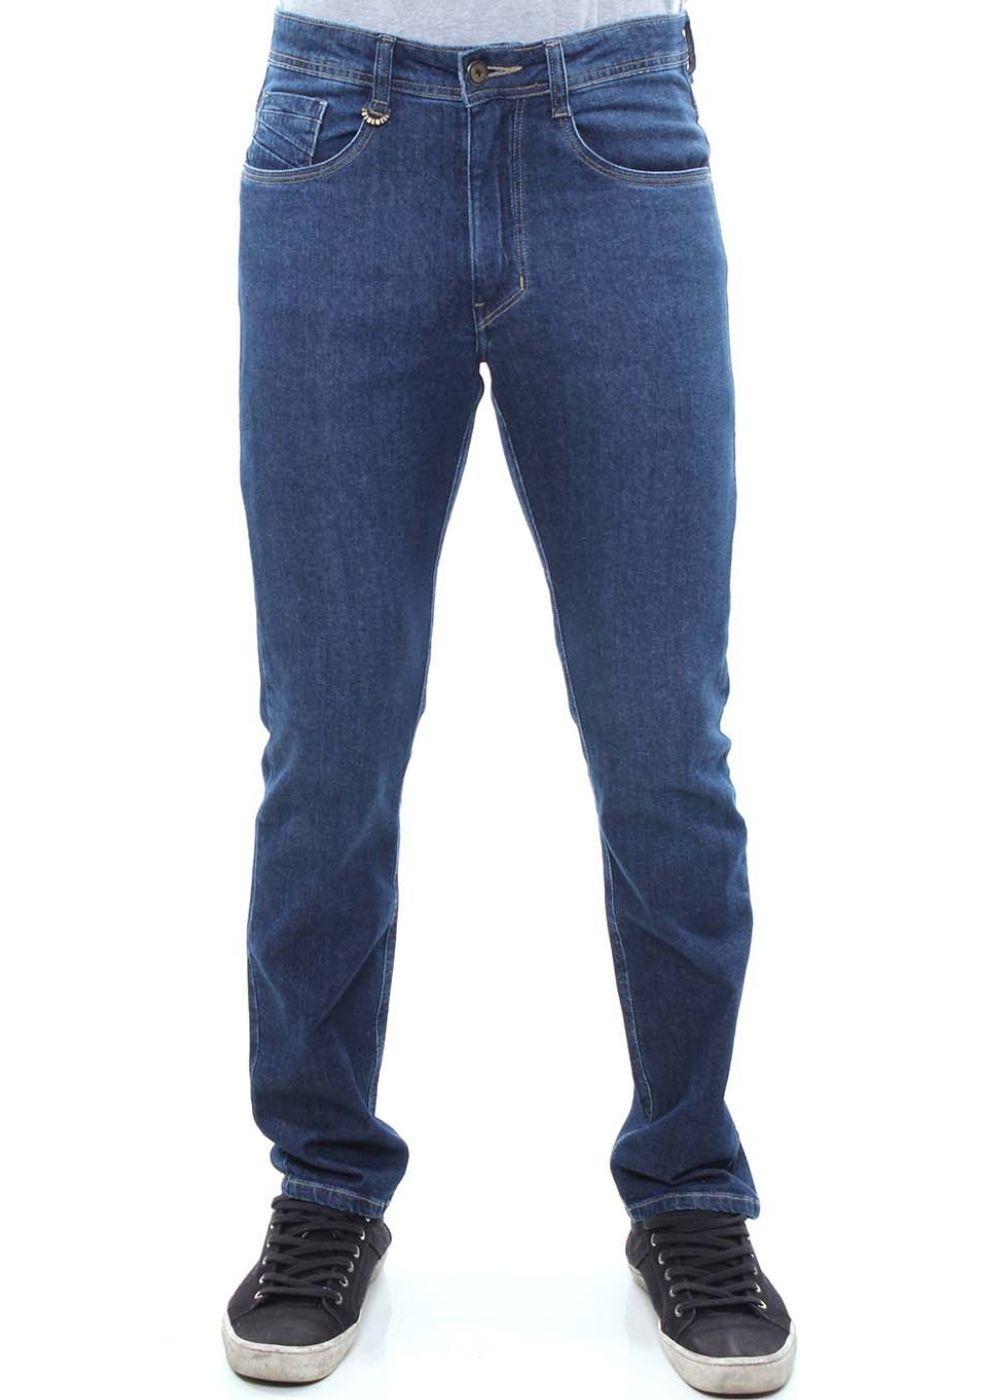 Calça Jeans Masculina Confort Crocker - 47760  - CROCKER JEANS